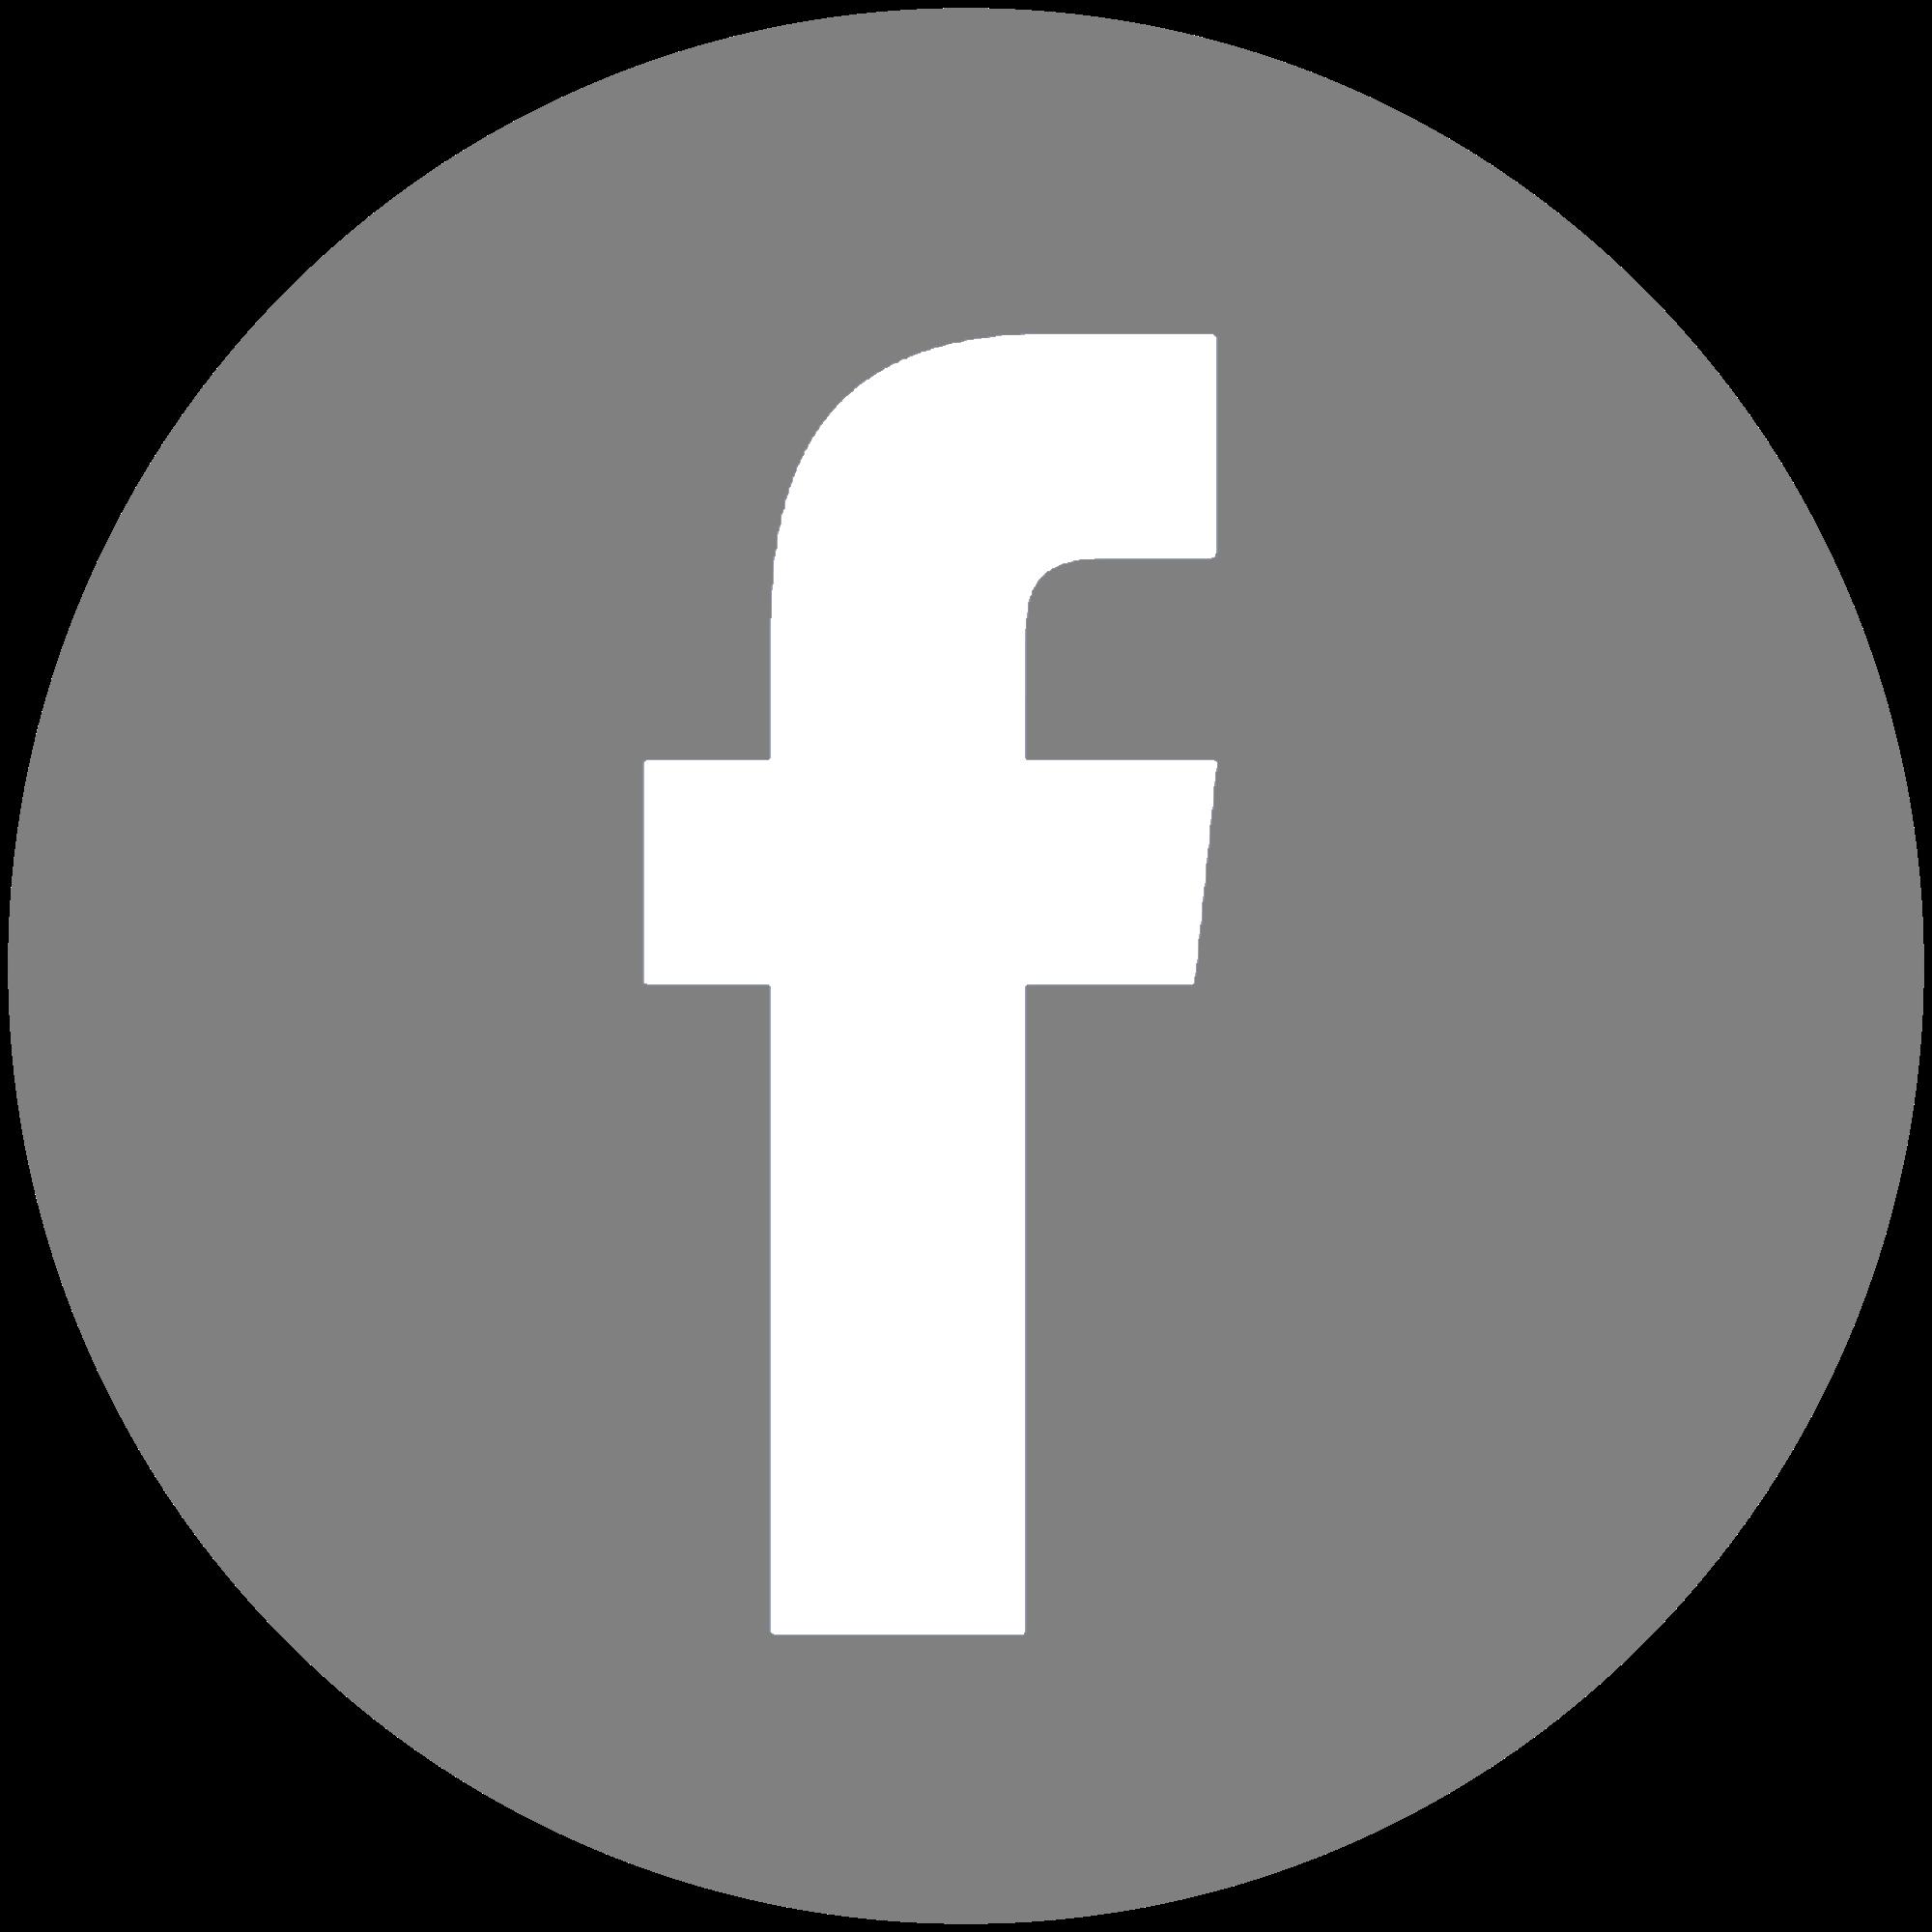 20120119193552!Facebook_icon